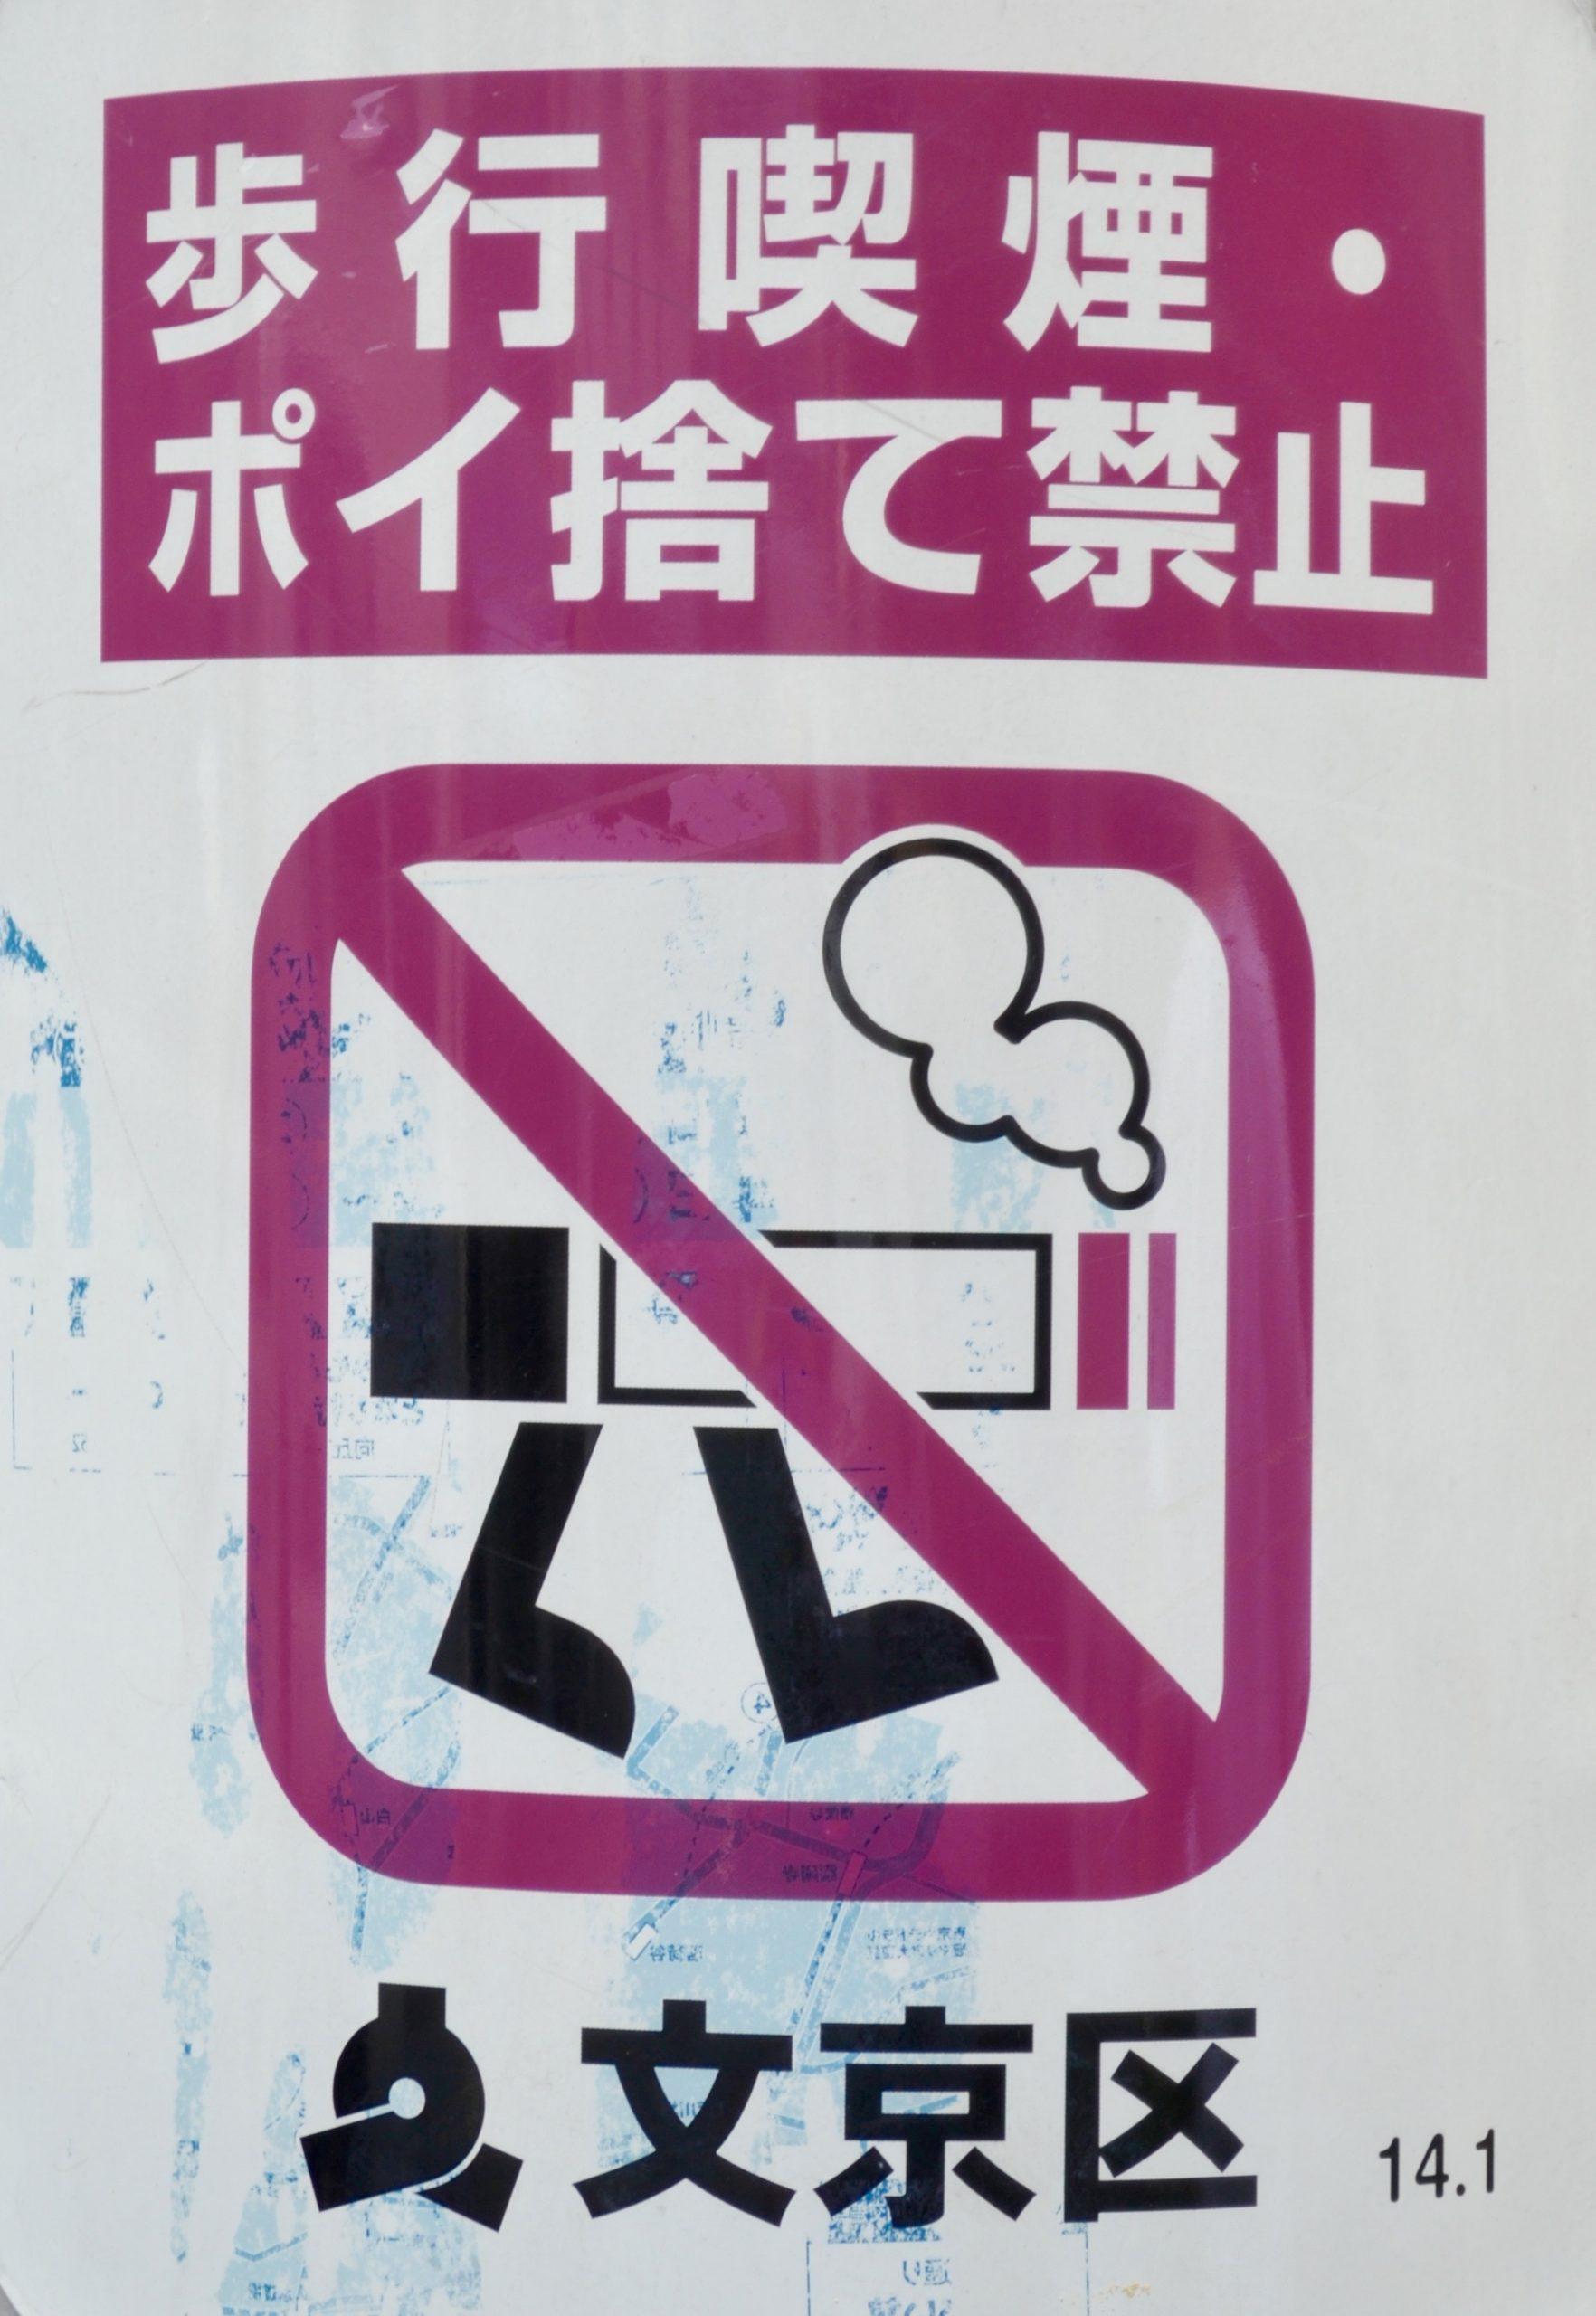 Japanese no smoking street sign